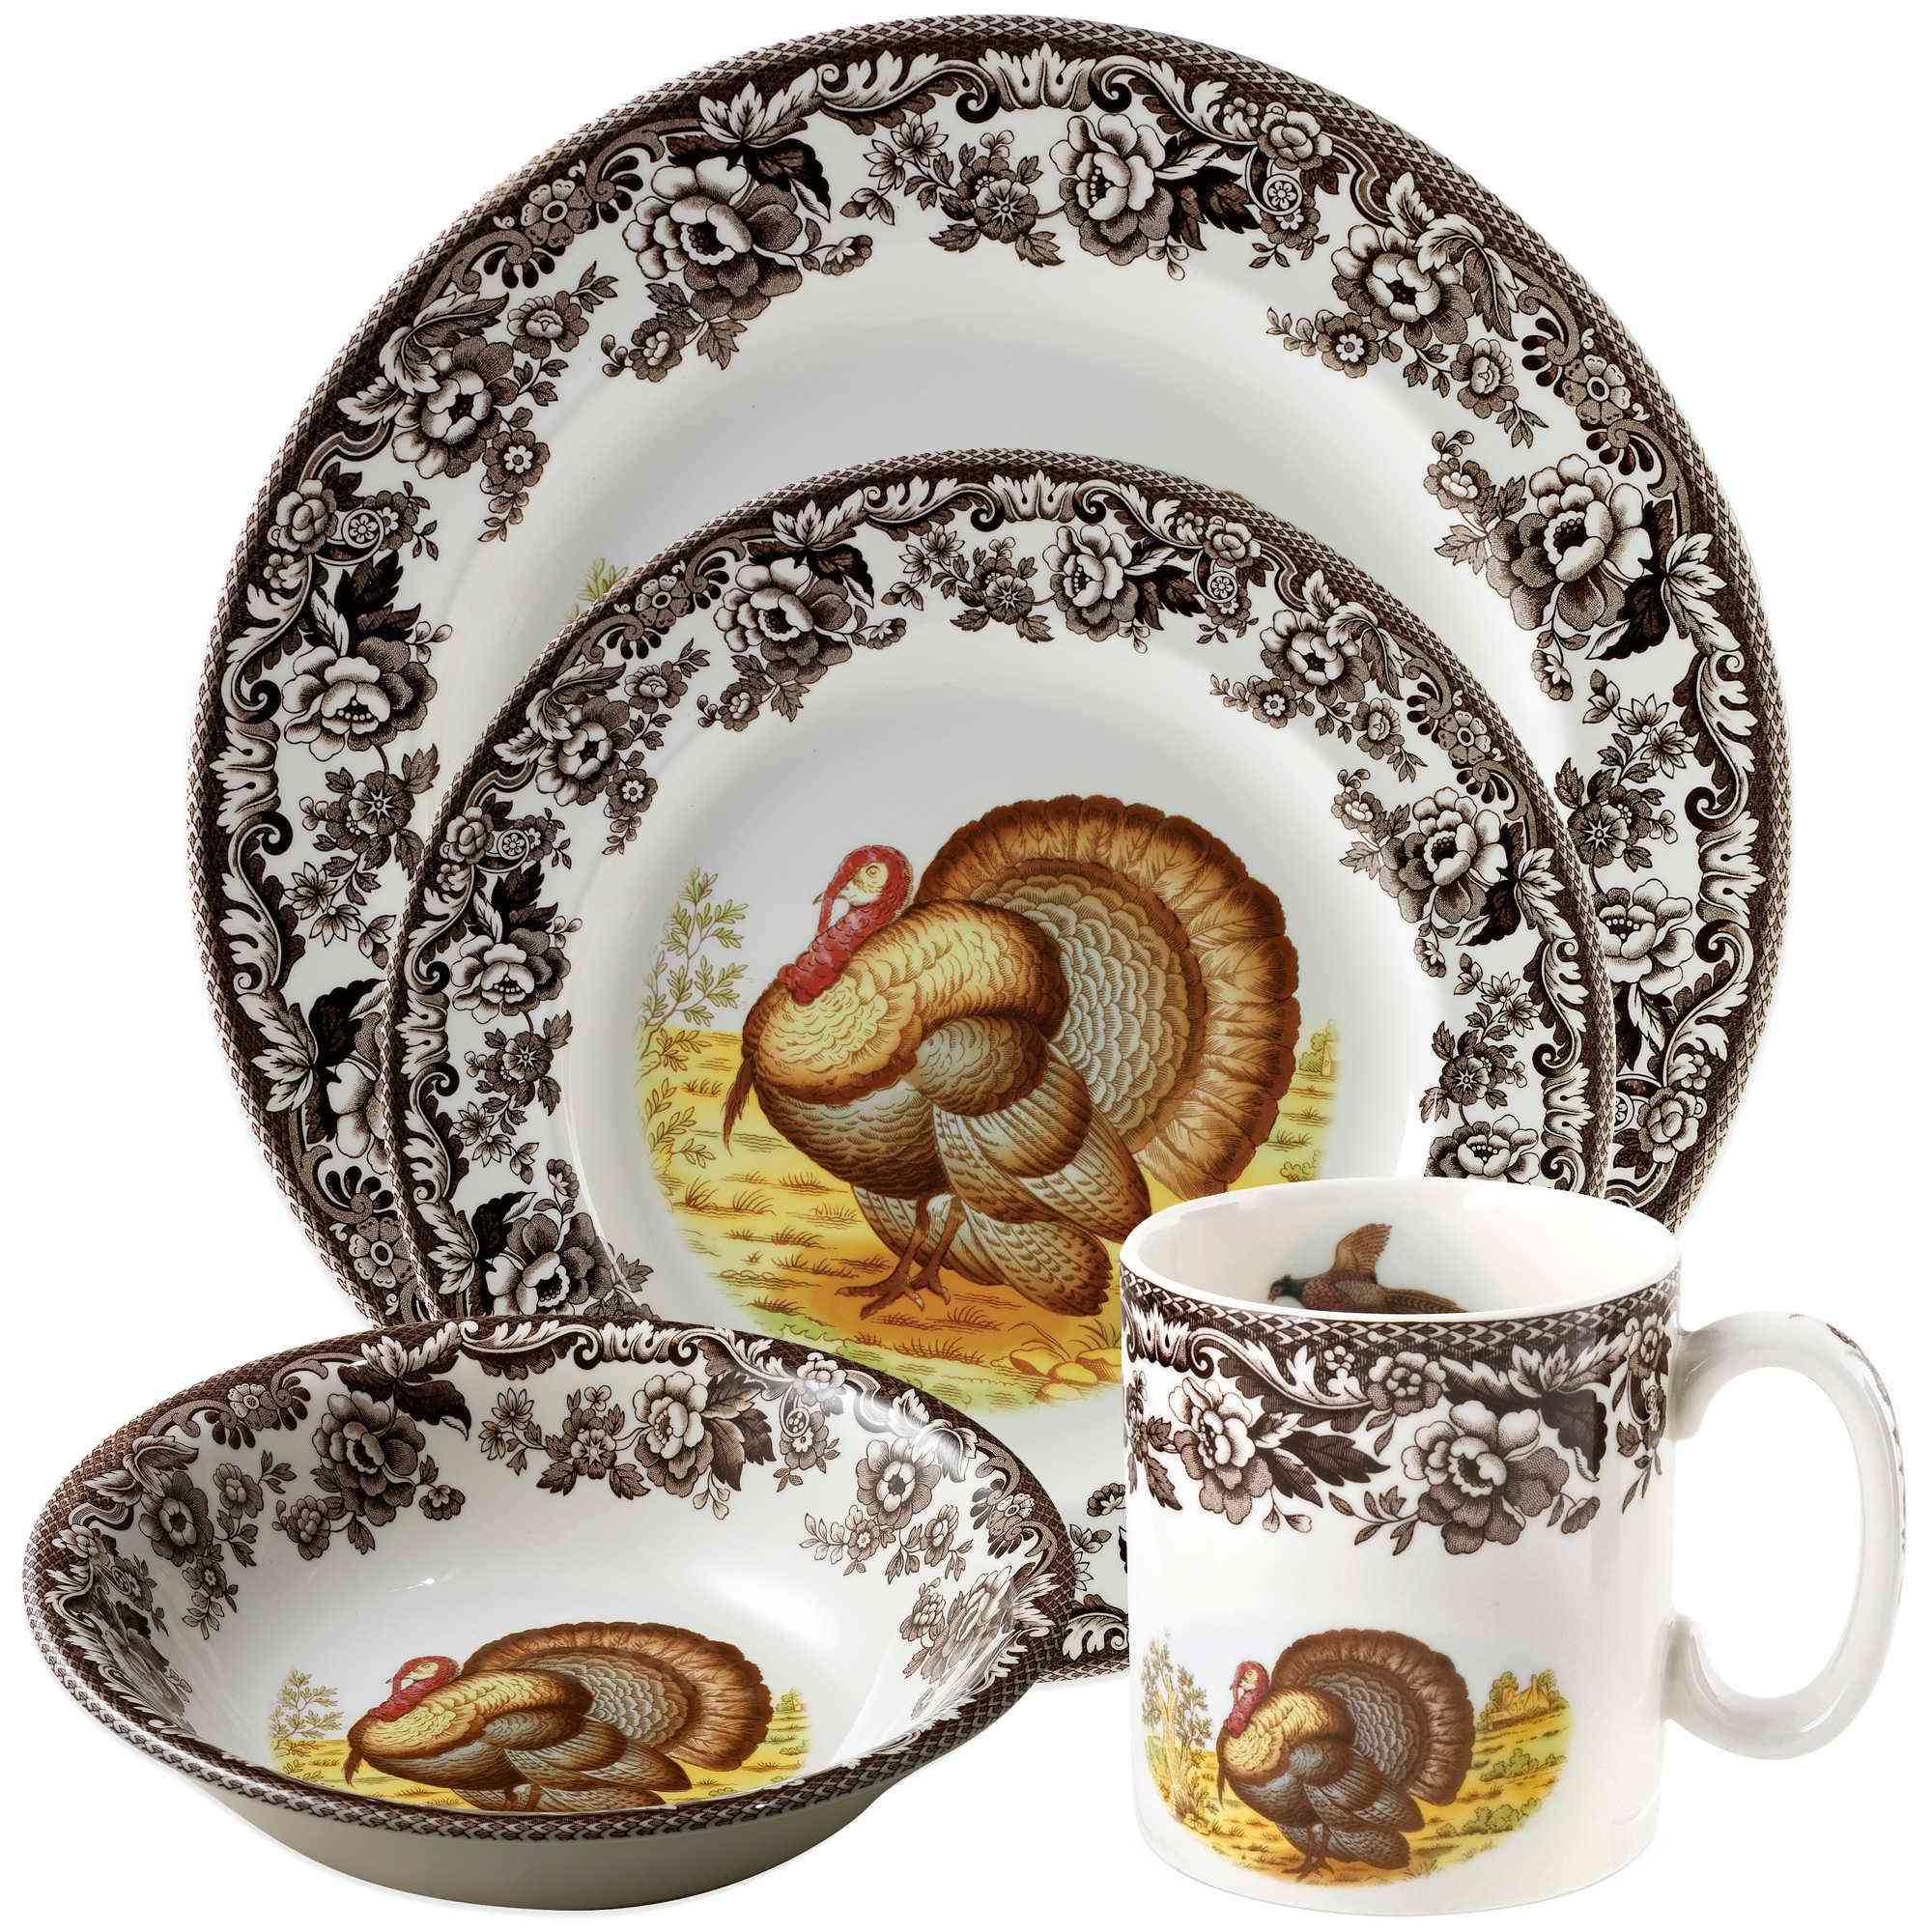 spode-turkey-plates